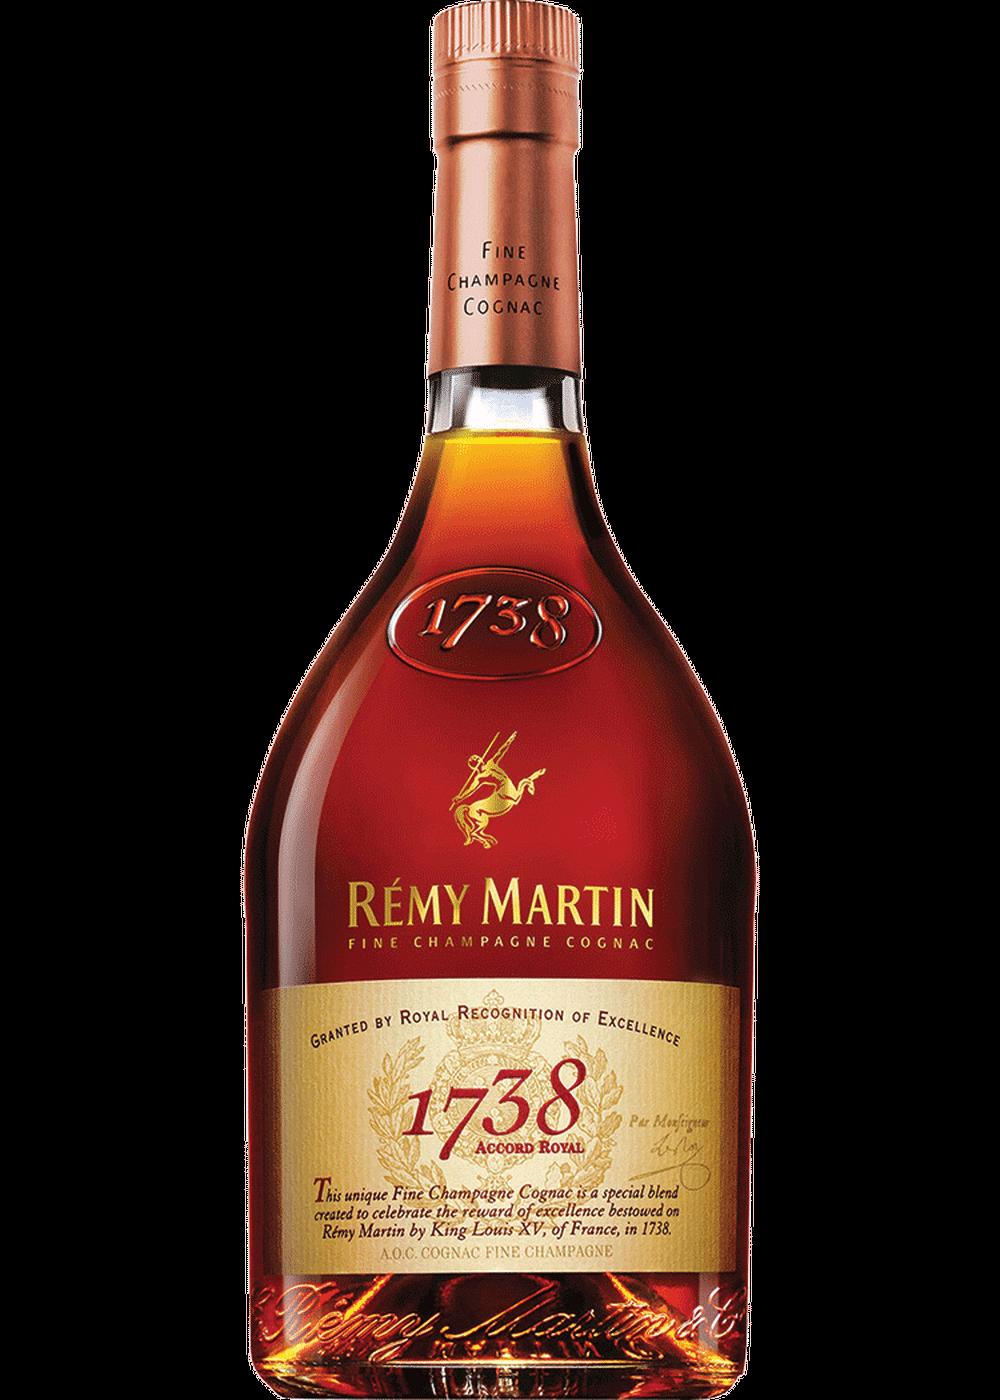 Remy Martin 1738 Remy Martin Wine Bottle Wine